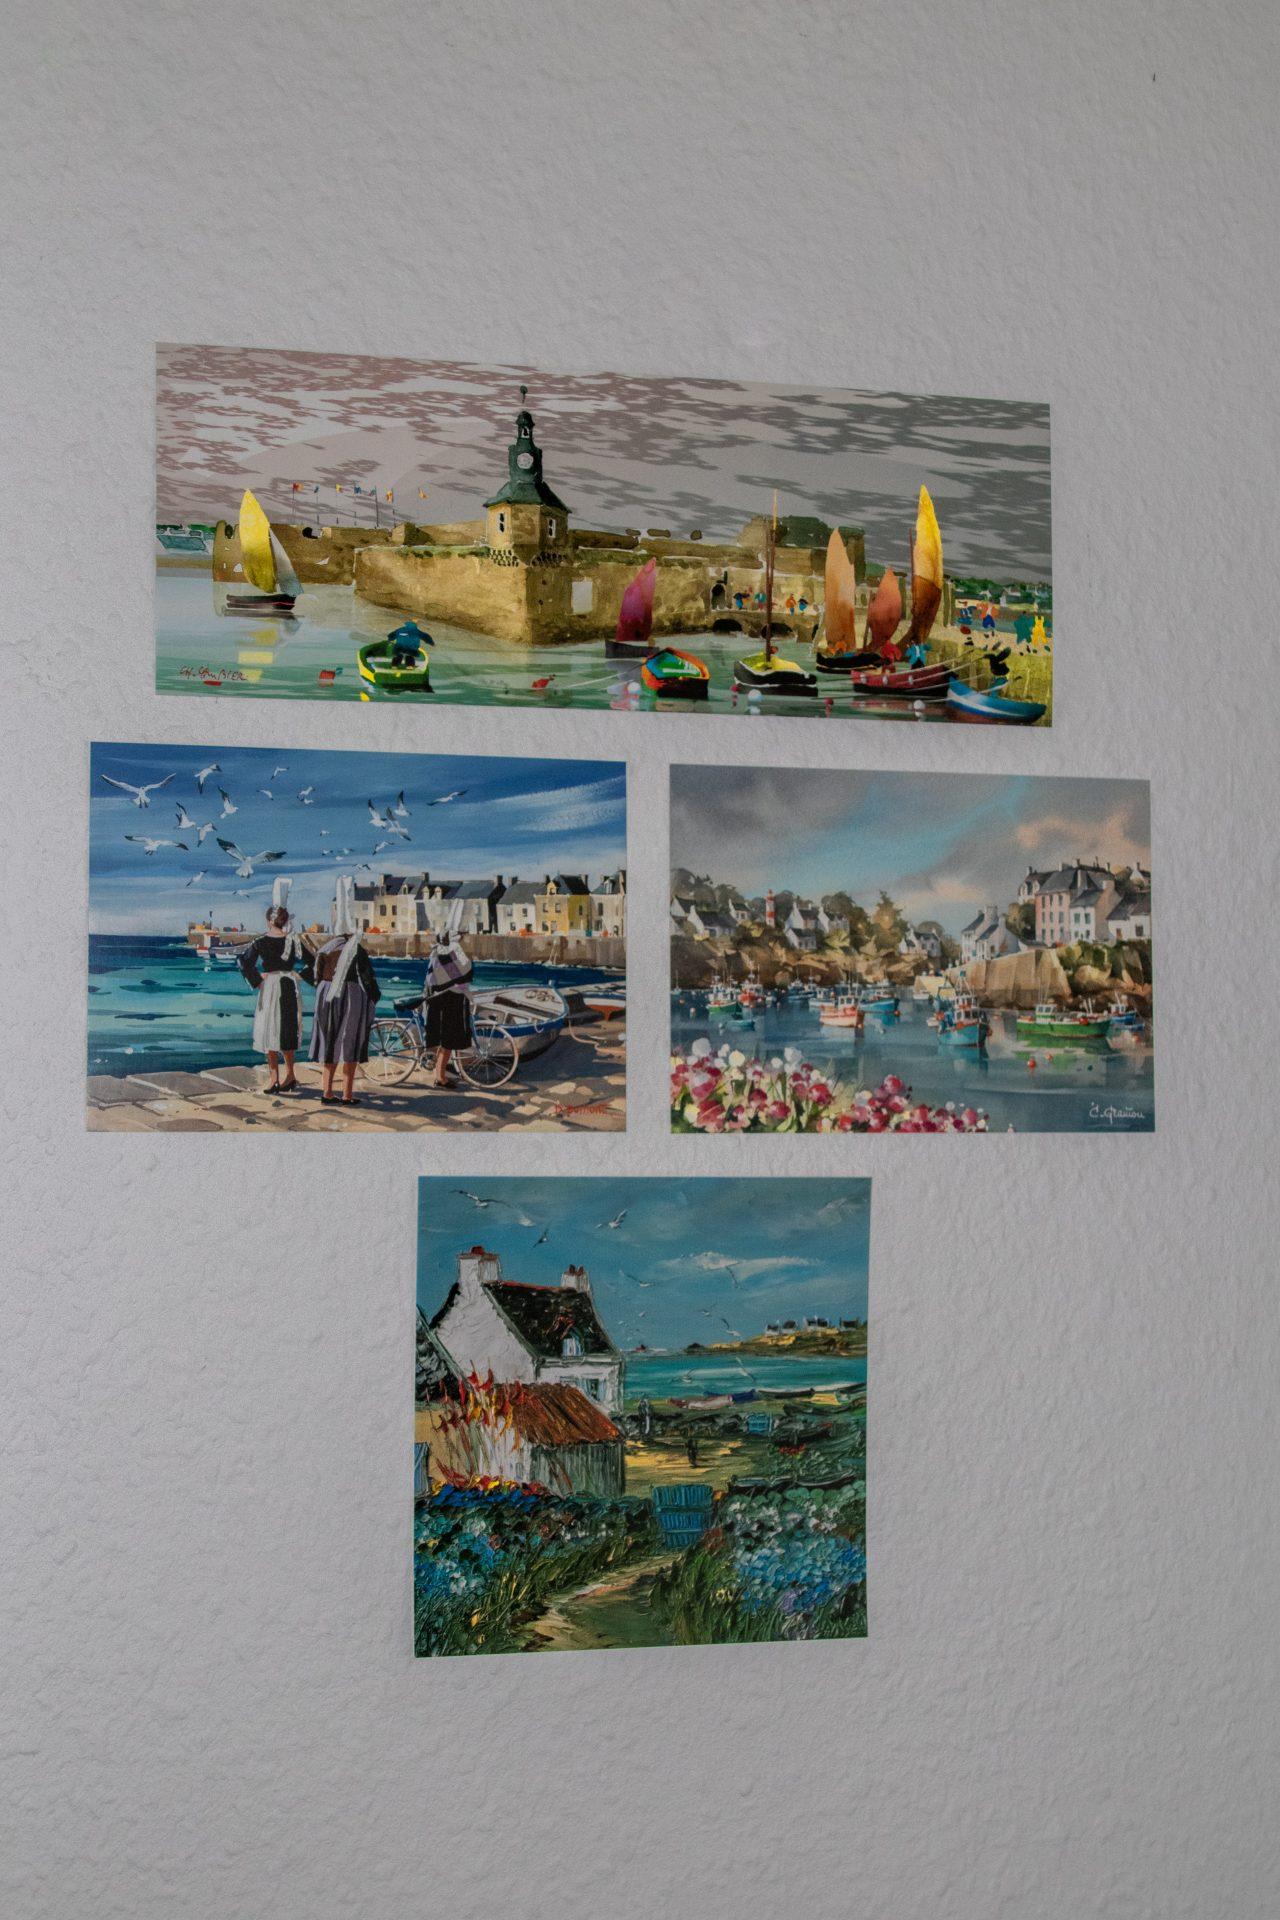 souvenirs-mitbringsel-urlaub-reise-postkarte